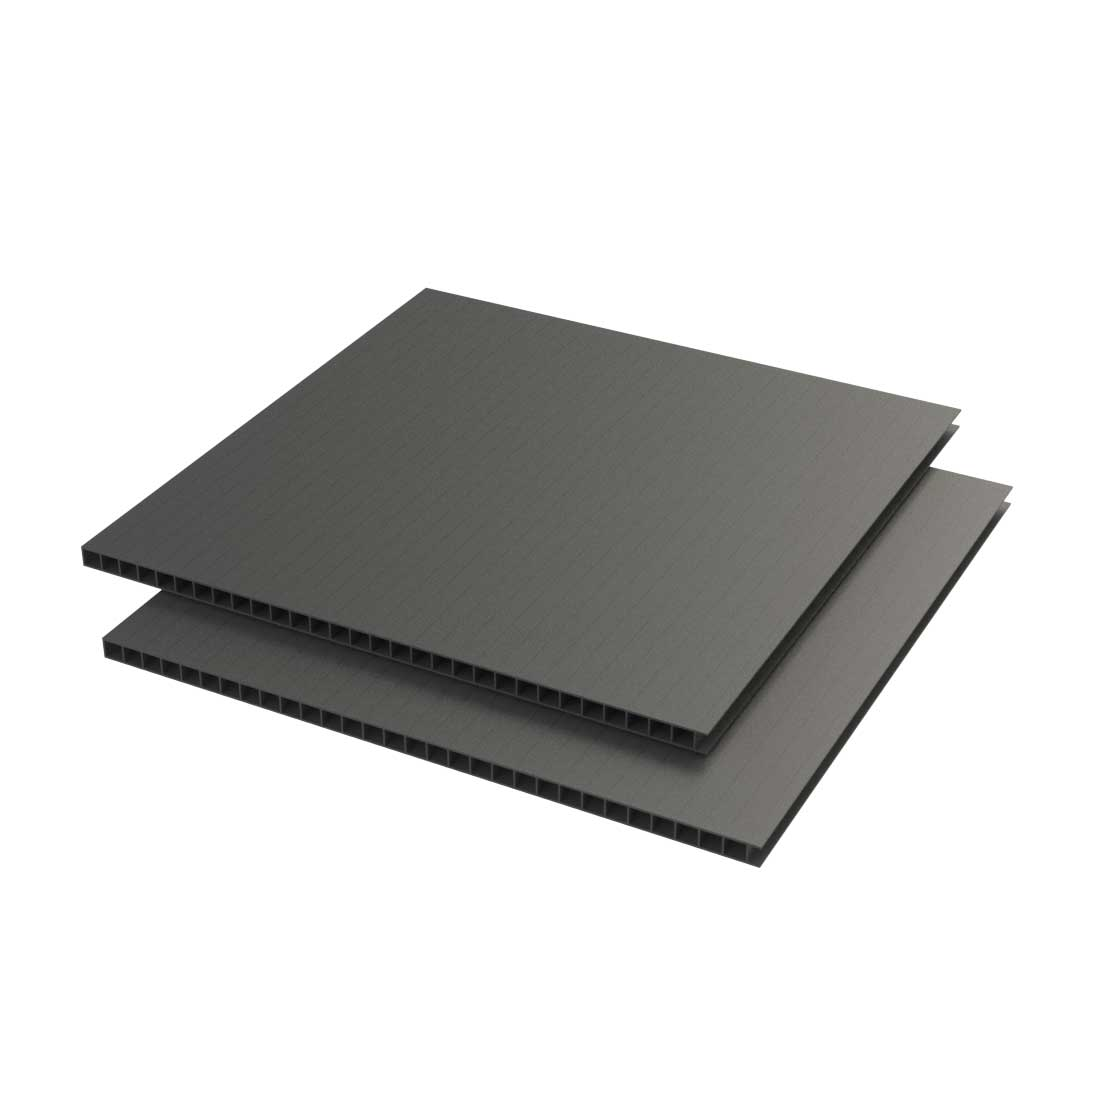 Vikuprop PP Plaat 600 gr/m2 Corona uv Zwart 1410x1010x3,5mm